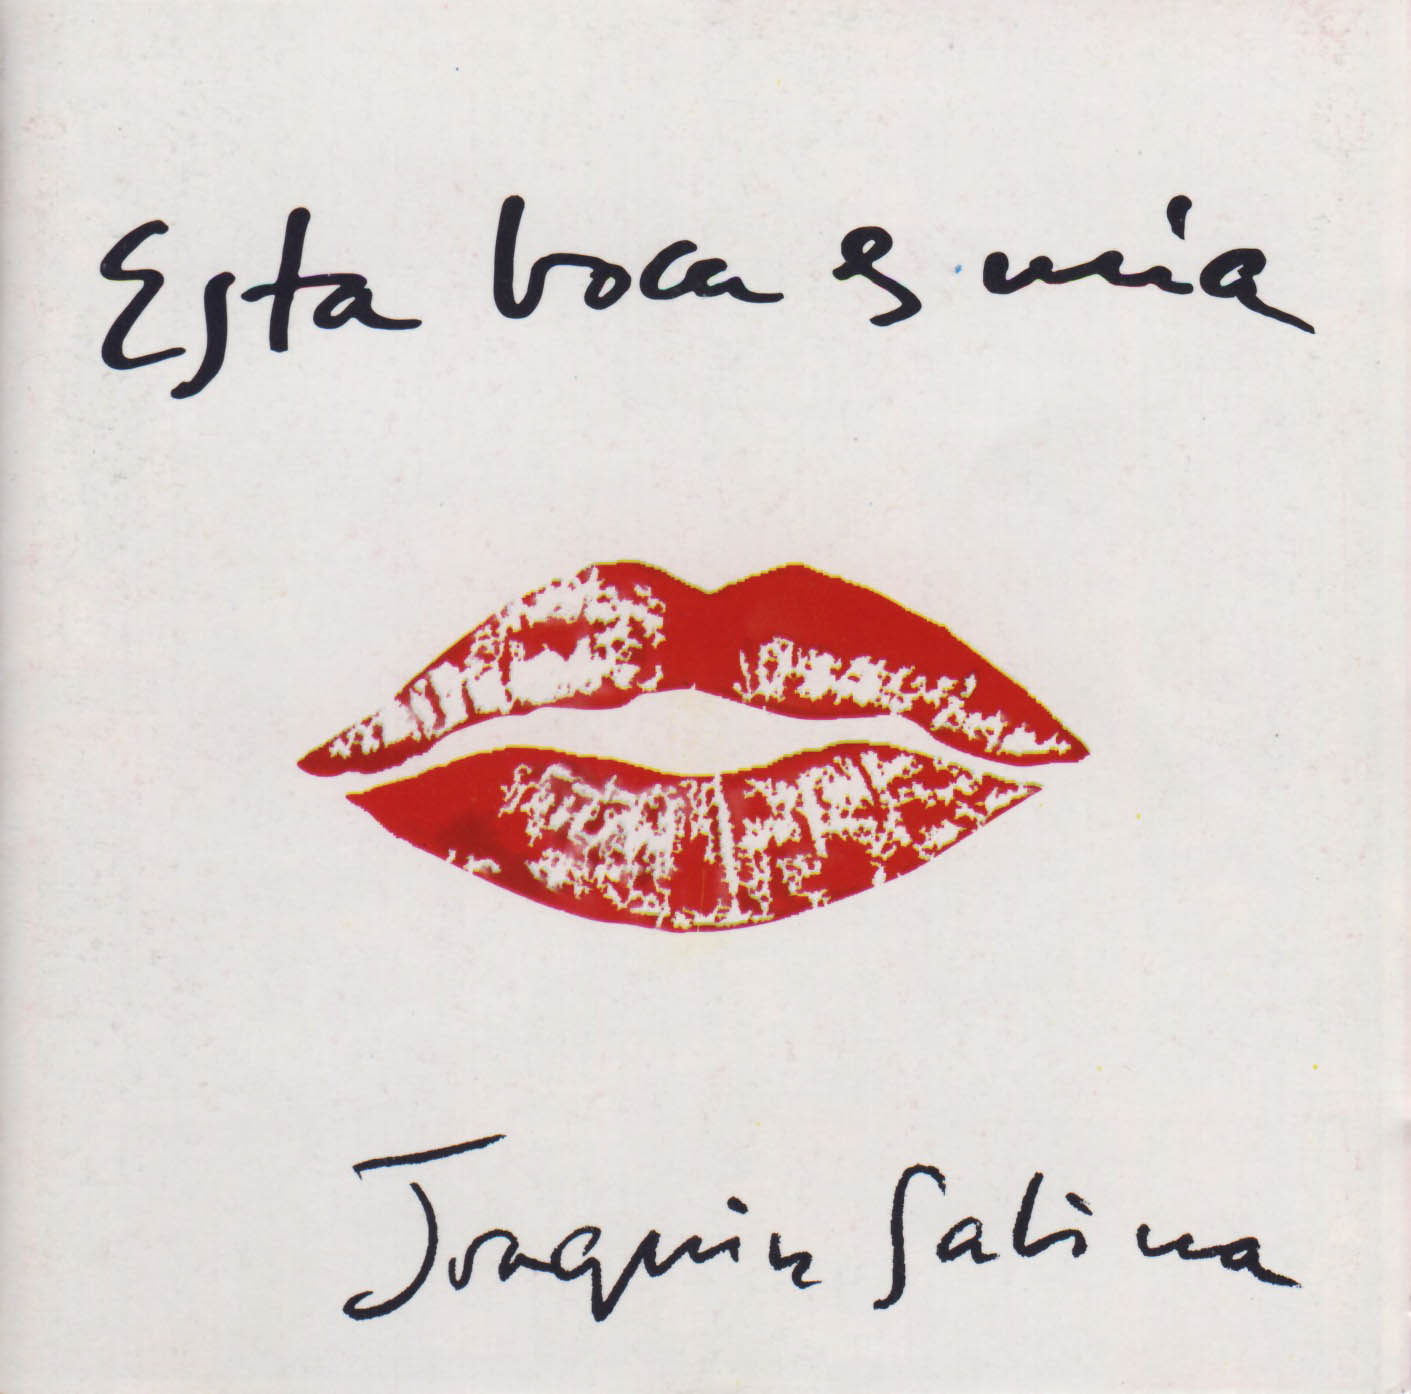 http://2.bp.blogspot.com/-eOYHPqHpqMI/TtpBmXZaI_I/AAAAAAAARGQ/mhmjxj0DJt0/s1600/JOAQUIN+SABINA-+Esta+boca+es+mia+1994.jpg